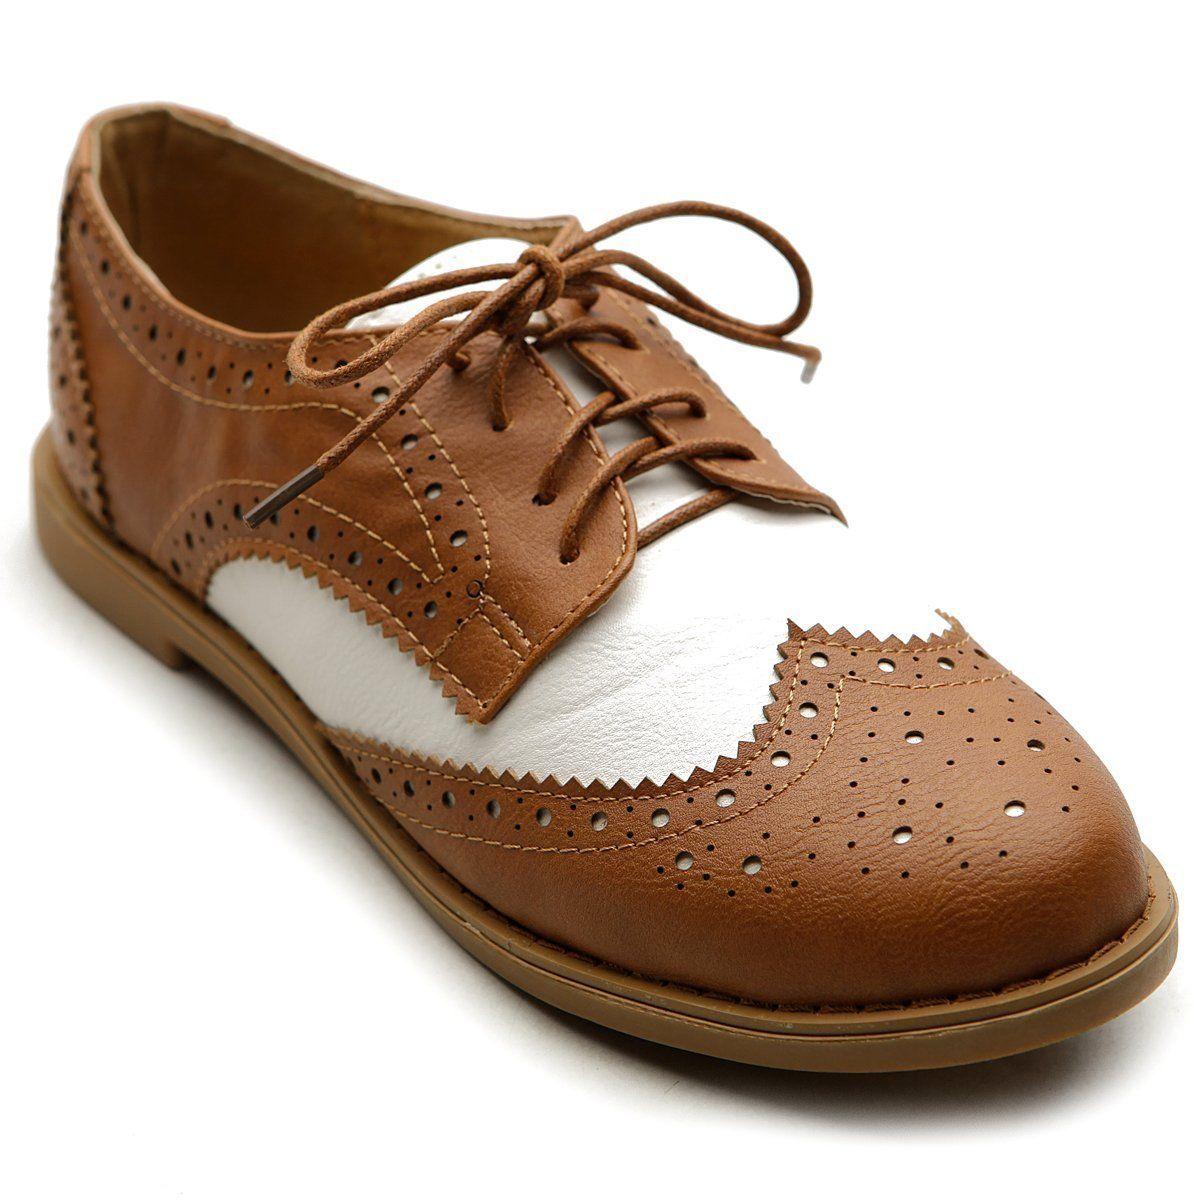 Oxford, Peep Toe | Flat shoes women